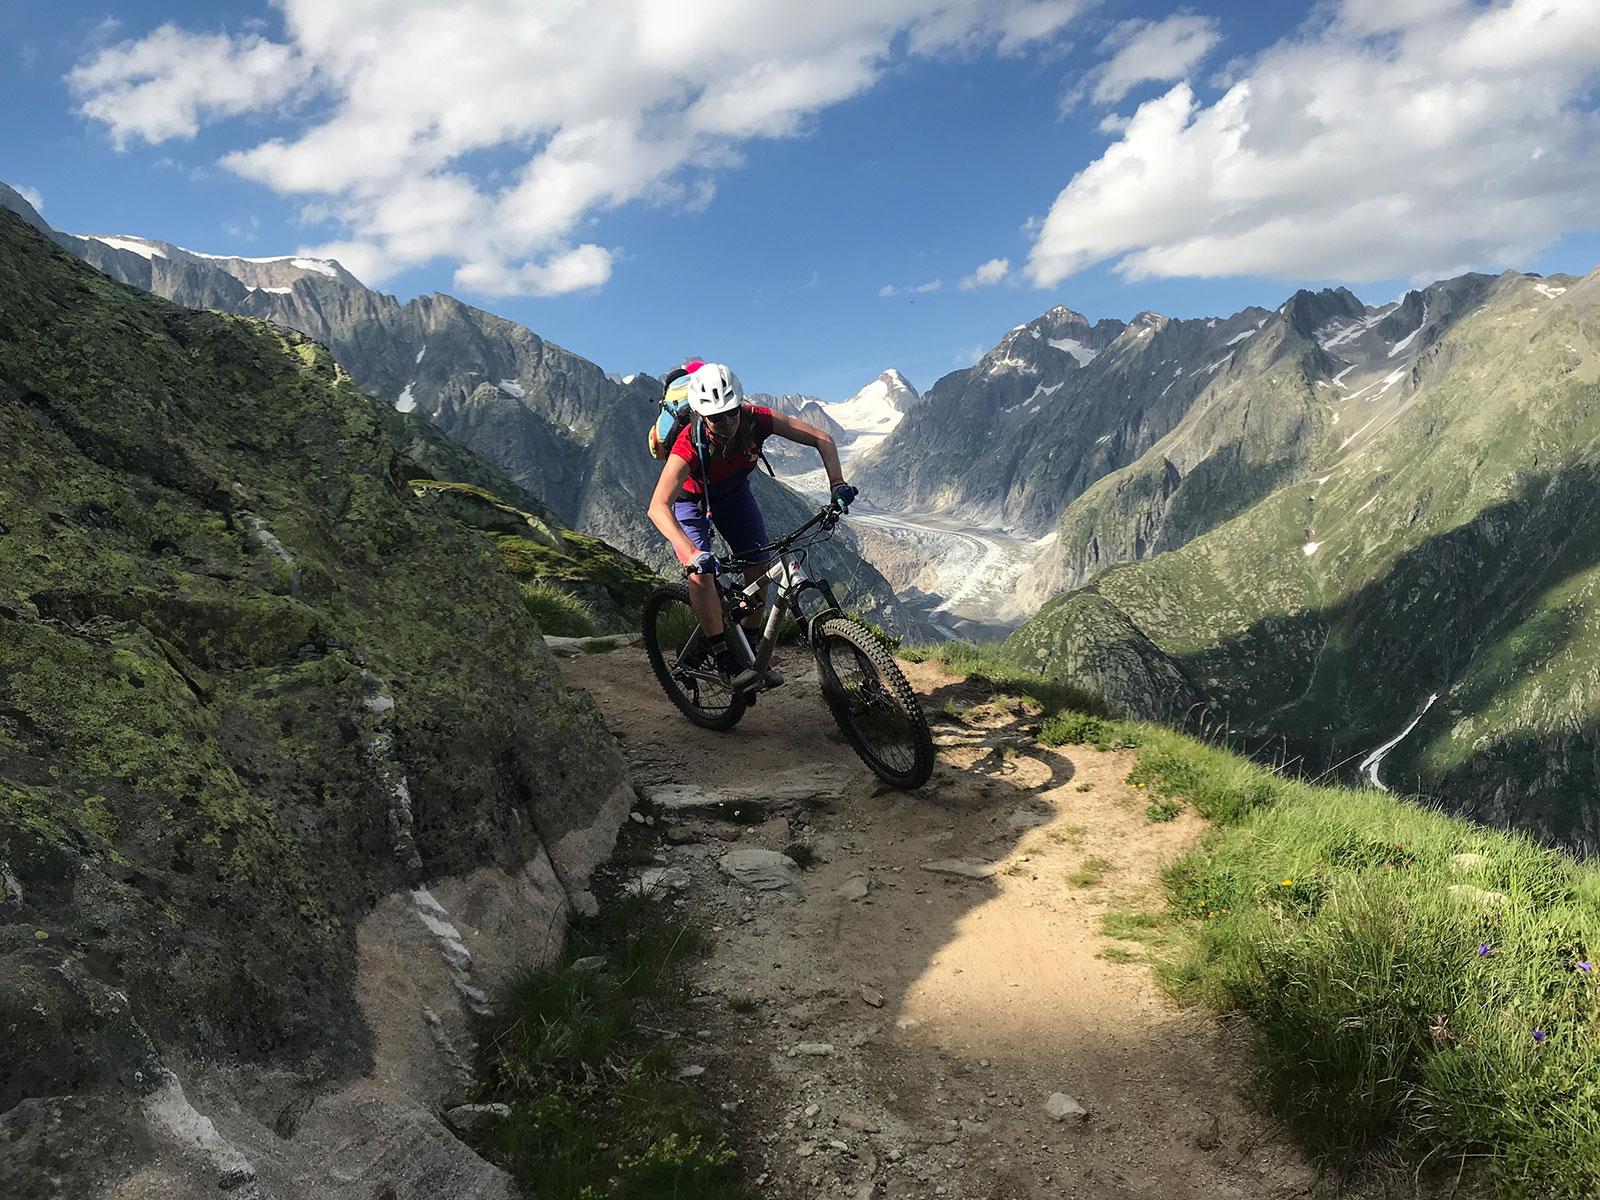 Joana_Schmidtjansen_Rumpeldipumpel_Mountainbiken_02